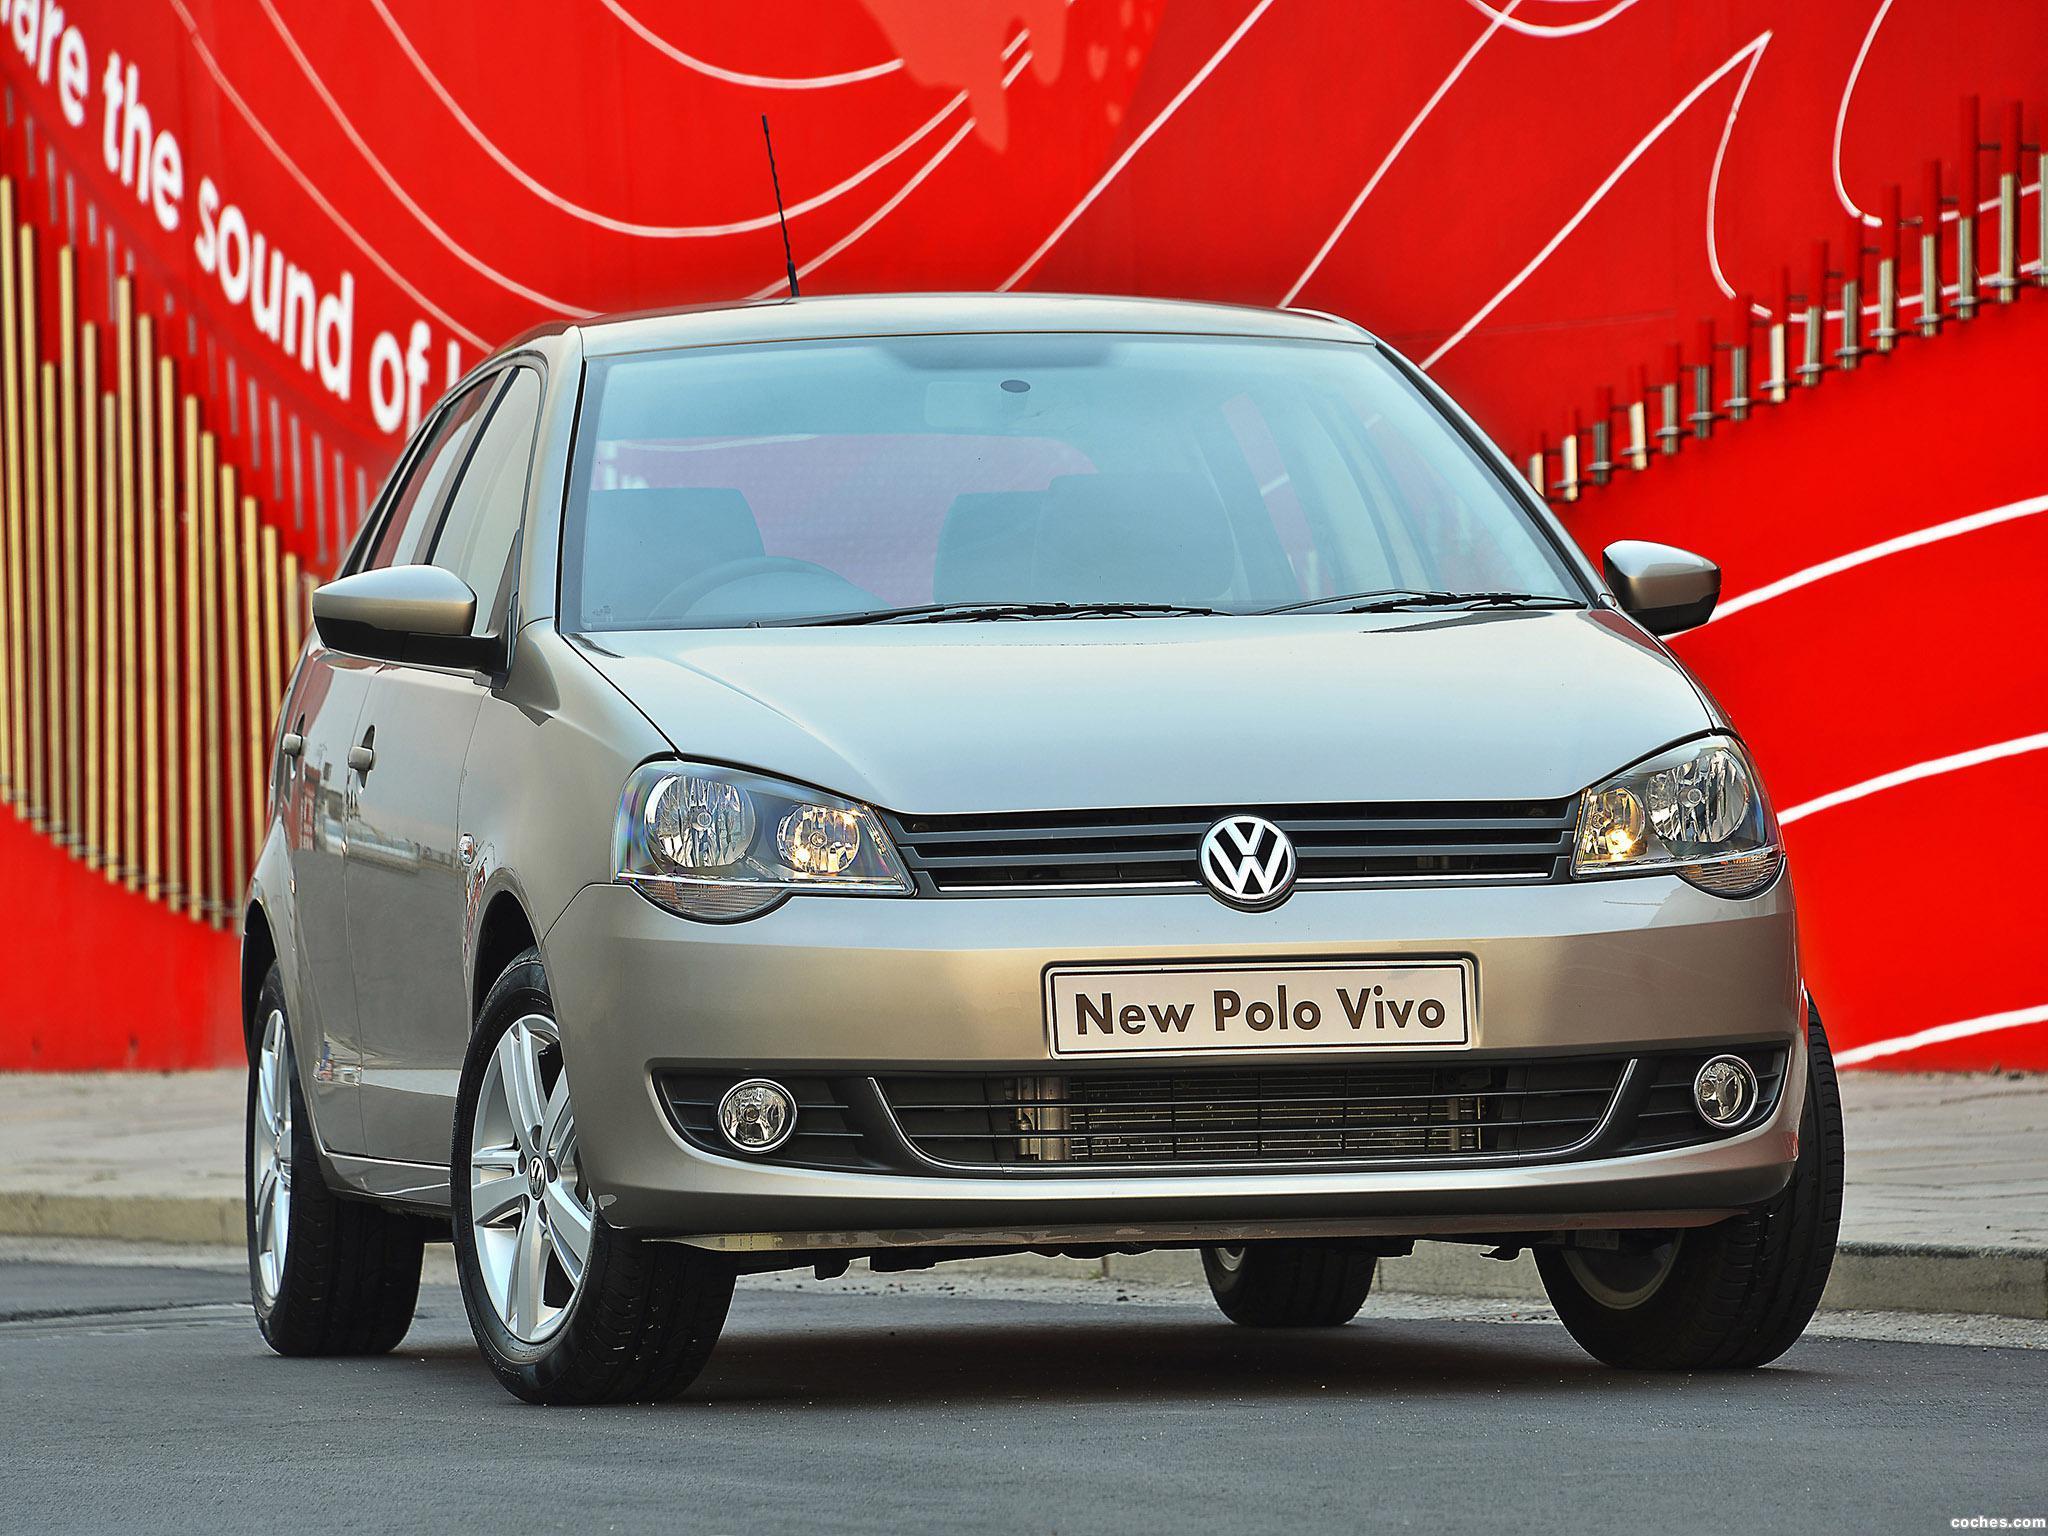 Foto 0 de Volkswagen Polo Vivo Hatchback 2014